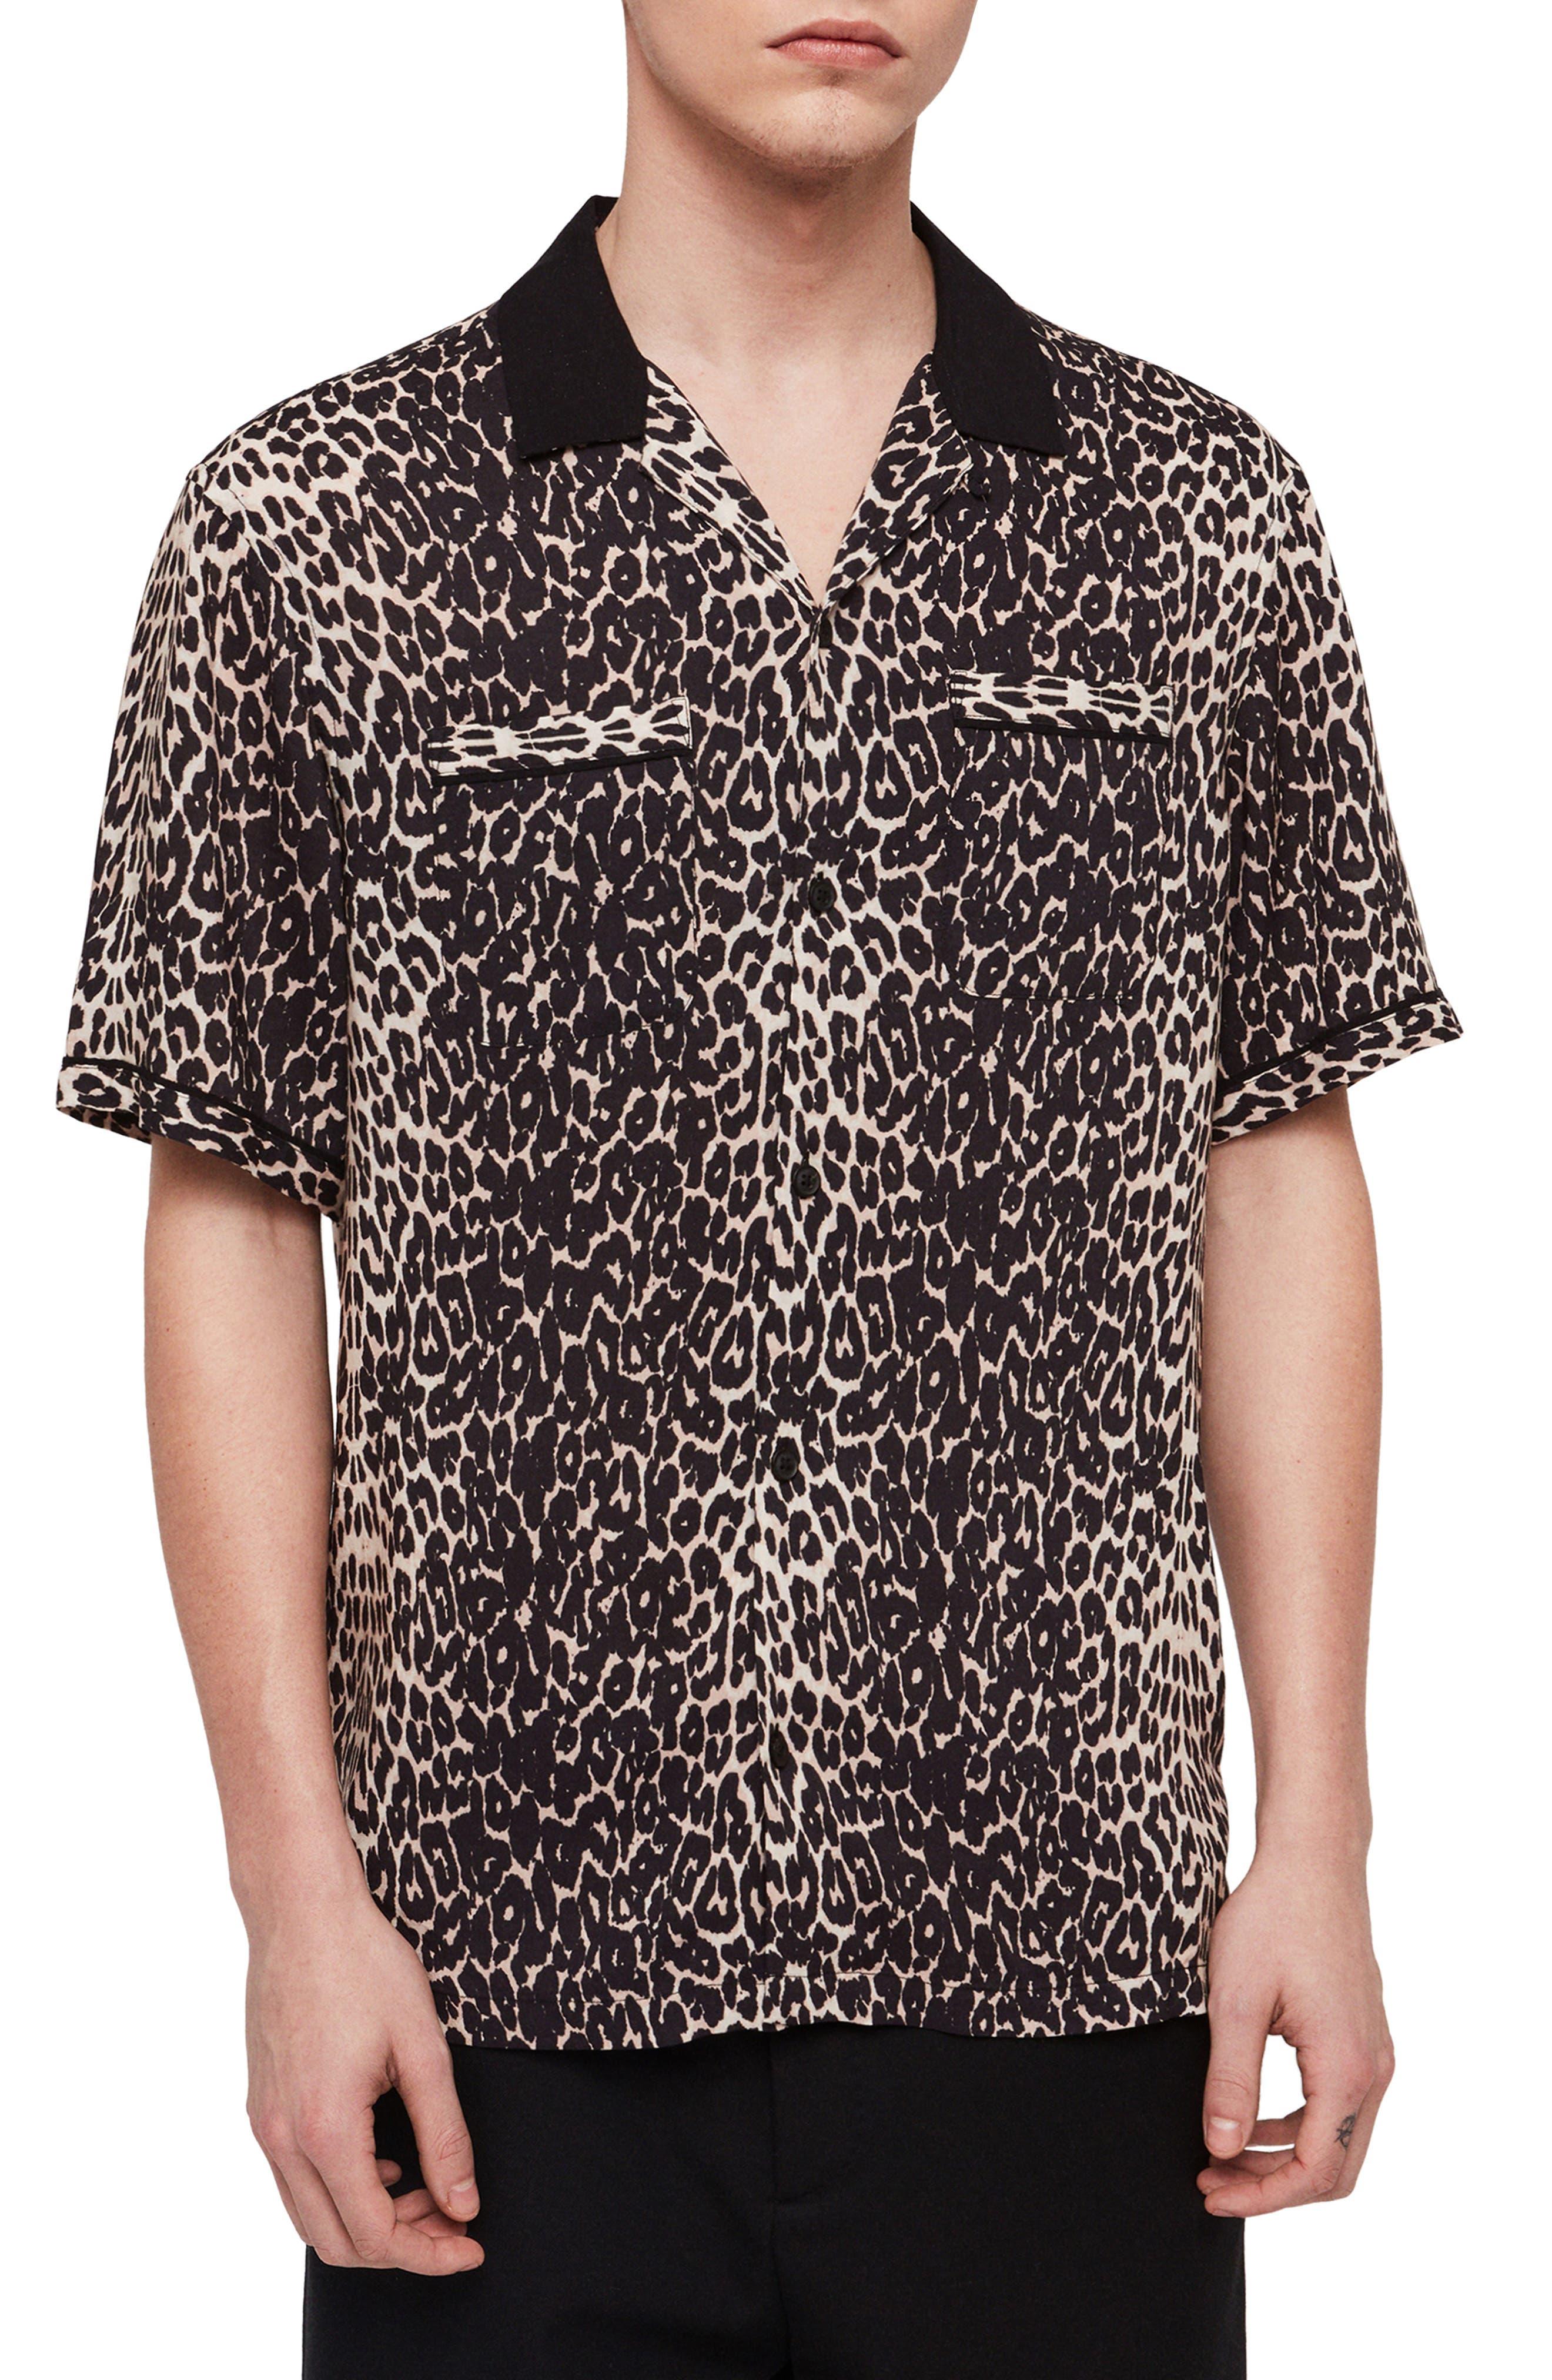 1960s – 70s Mens Shirts- Disco Shirts, Hippie Shirts Mens Allsaints Feline Slim Fit Camp Shirt $64.98 AT vintagedancer.com